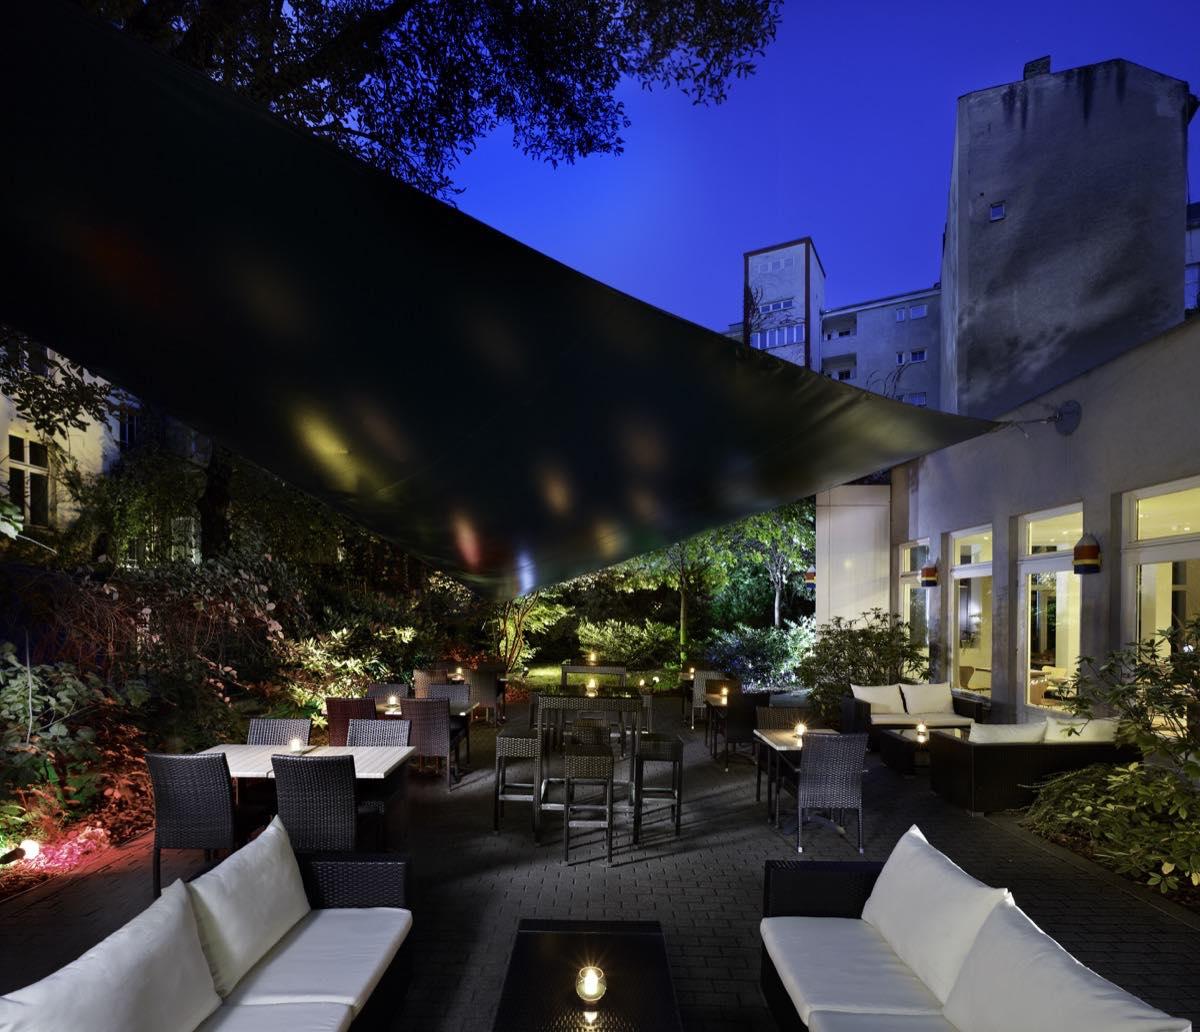 park plaza berlin kudamm berlin hotel arenaturist. Black Bedroom Furniture Sets. Home Design Ideas